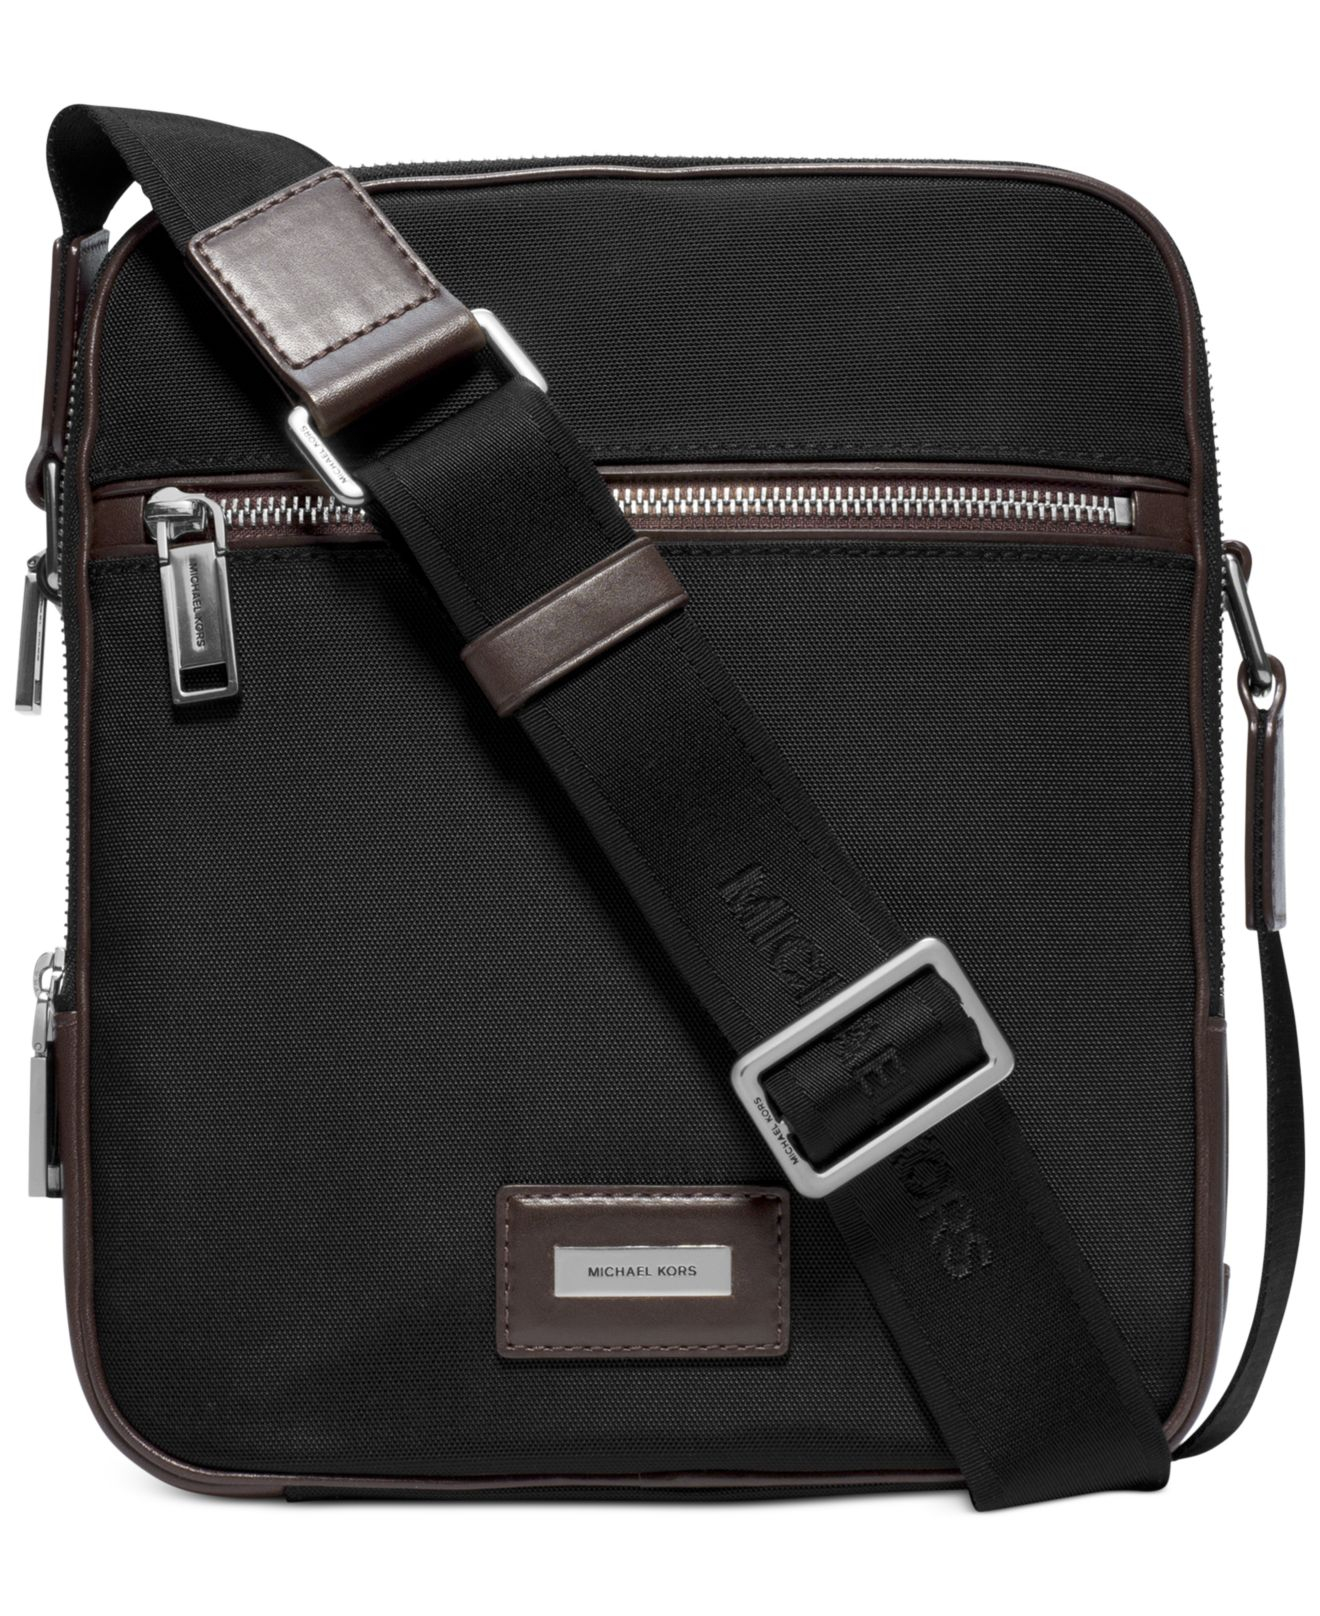 d20b6eef0cfb Lyst - Michael Kors Windsor Small Flight Bag in Black for Men